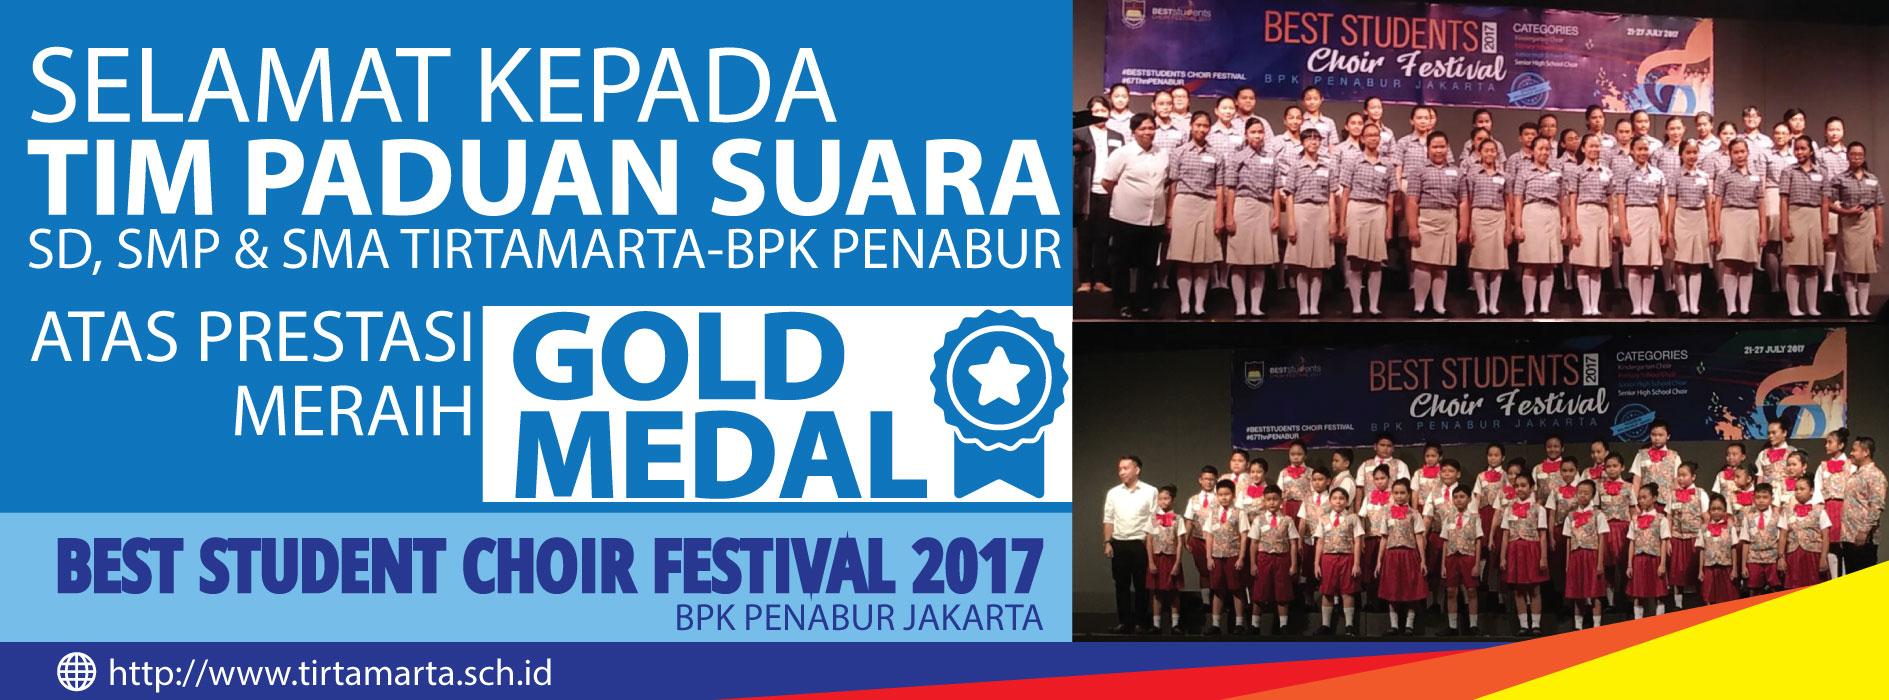 SD SMP SMA TIRTAMARTA BPK SEKOLAH PENABUR JAKARTA BEST STUDENT CHOIR FESTIVAL 2017 GOLD MEDAL SELAMAT ATAS PRESTASI